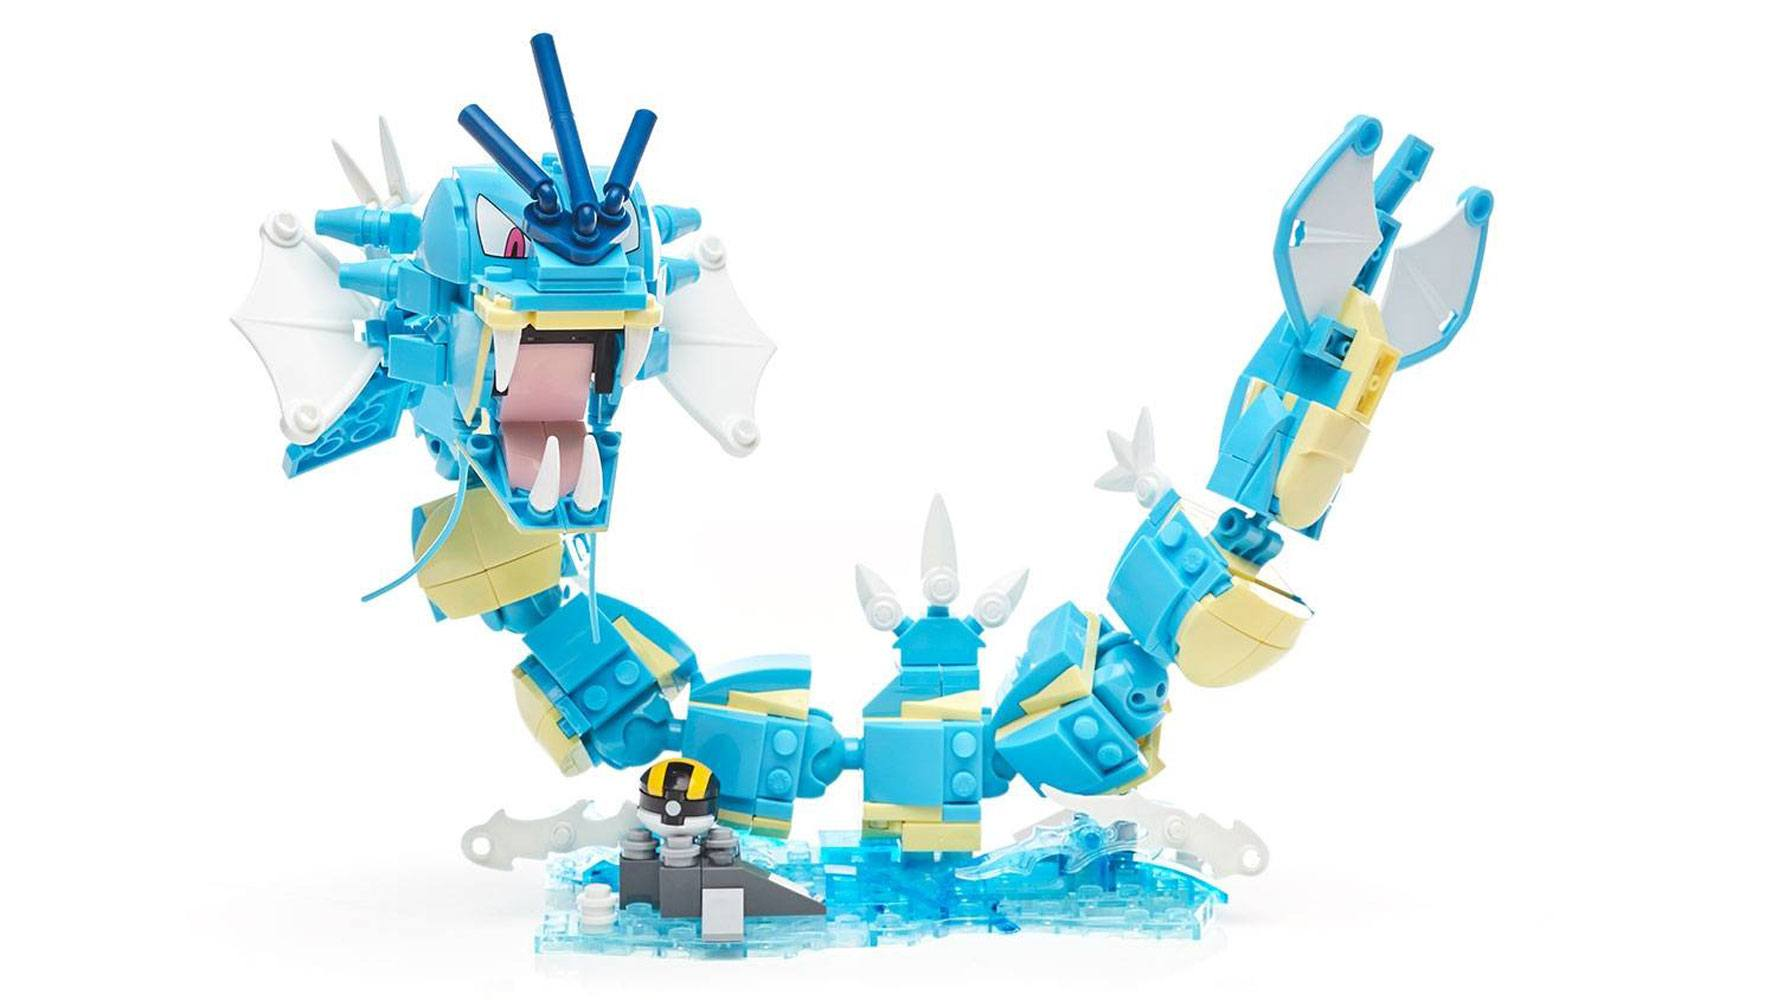 Pokémon Mega Construx Construction Set Gyarados 23 cm